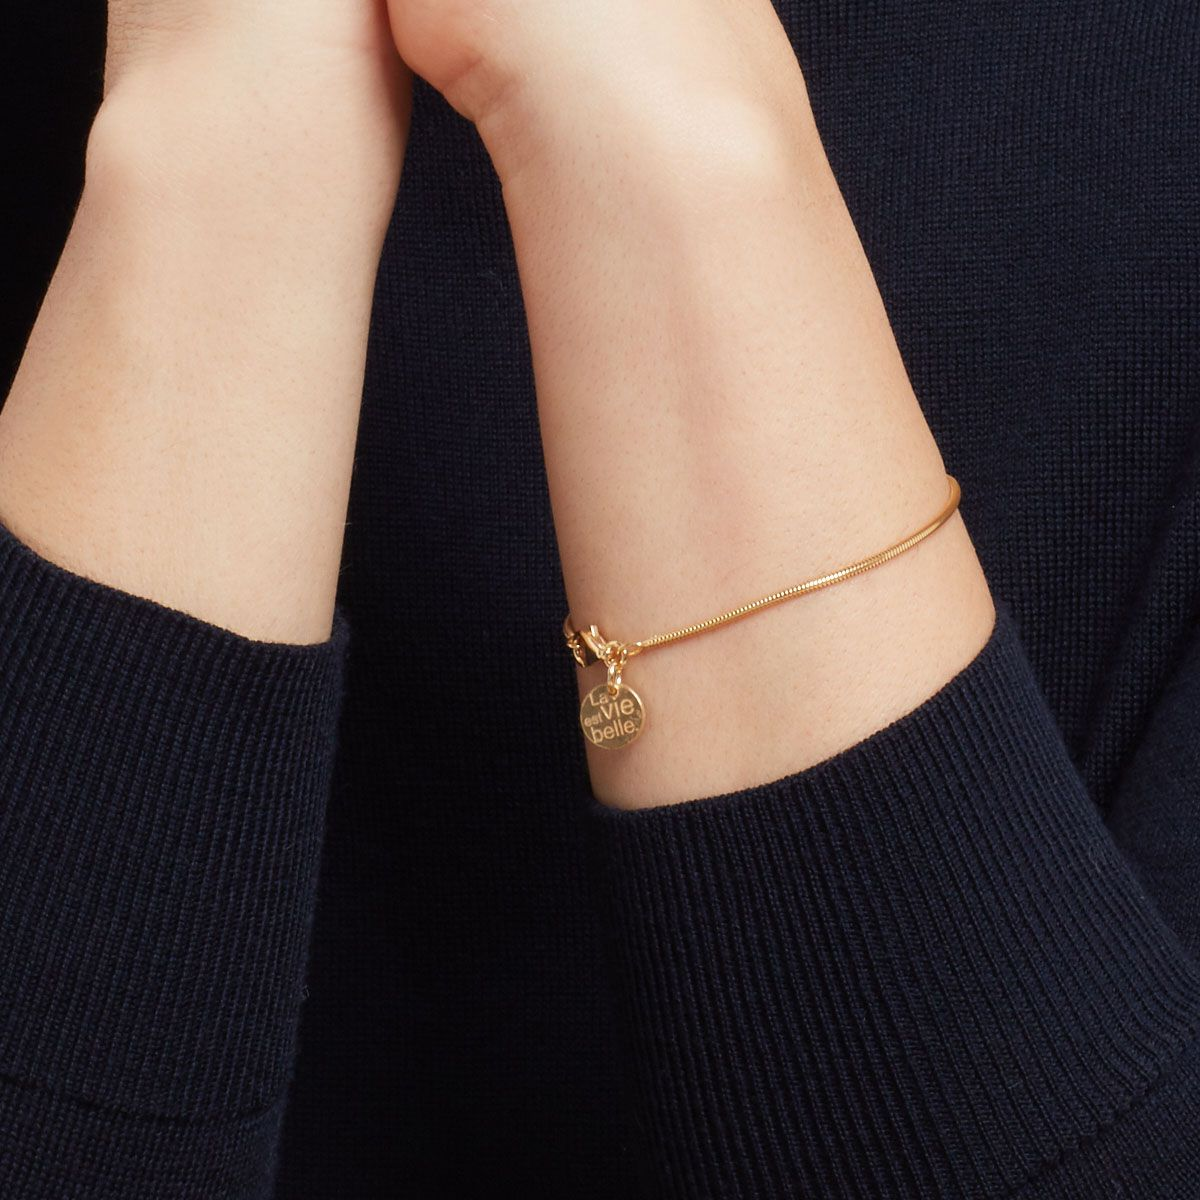 Calliope - Armband - 18k vergoldet